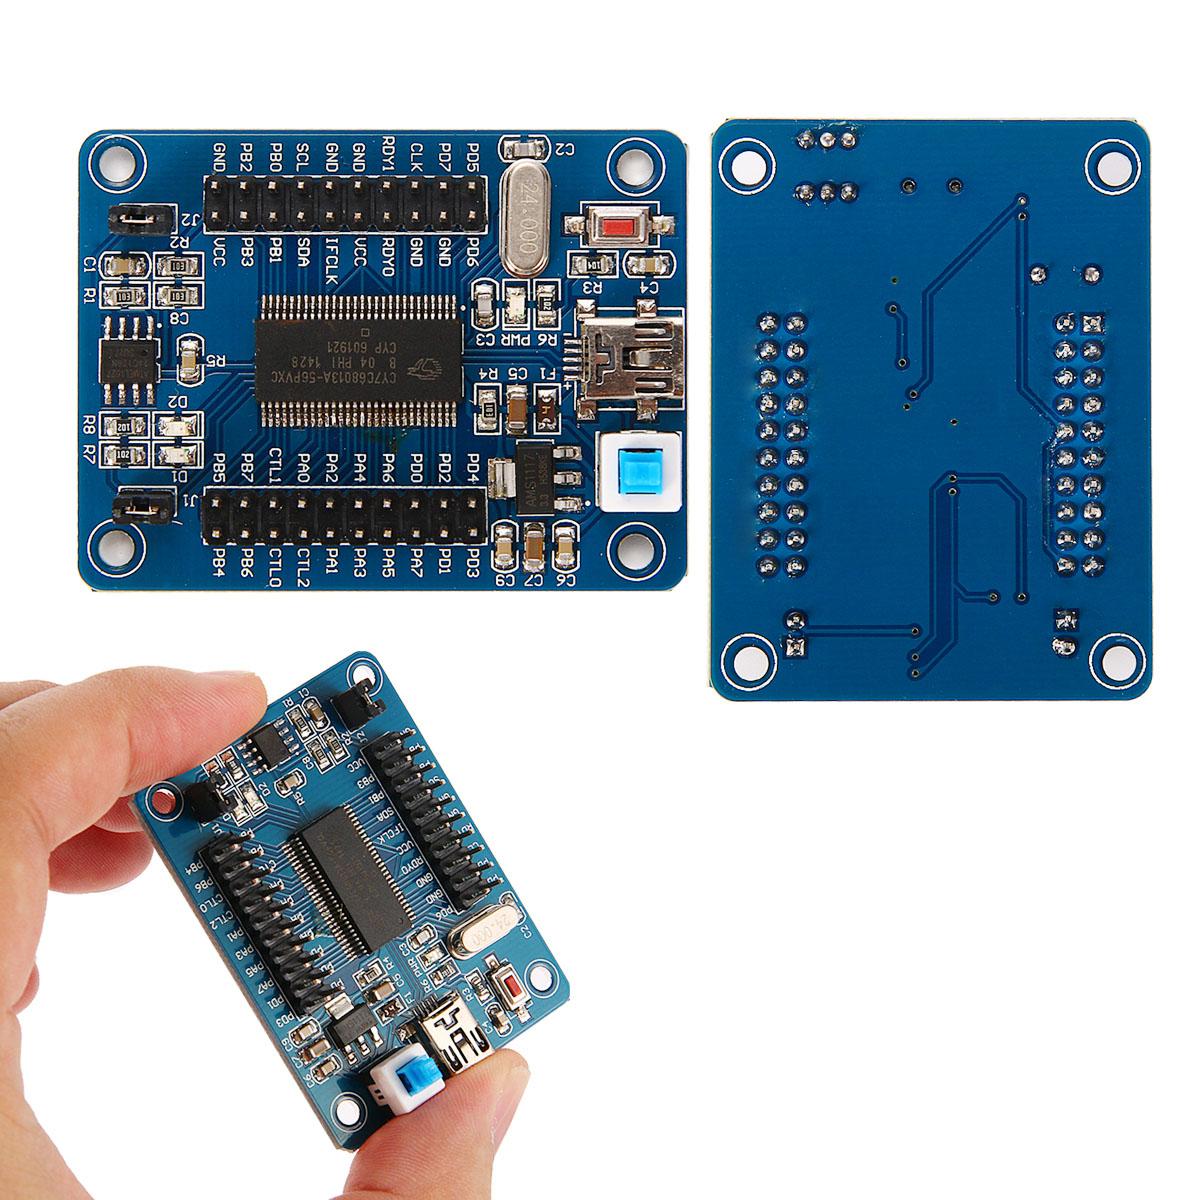 EZ-USB FX2LP CY7C68013A USB Core Board Development Logic Analyzer EEPROM TE382(China (Mainland))